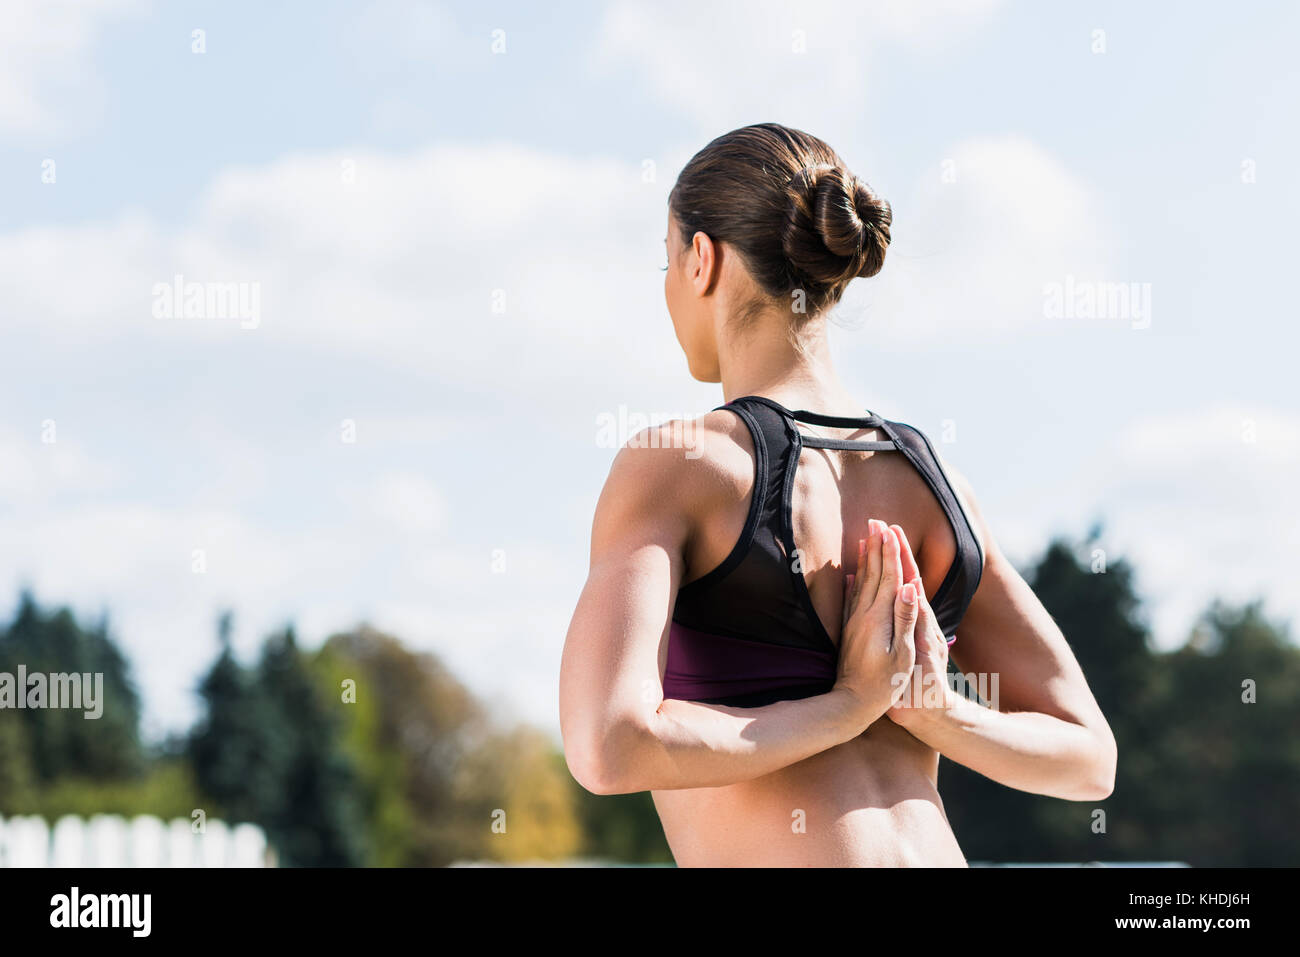 yogini in Reverse Prayer Pose - Stock Image